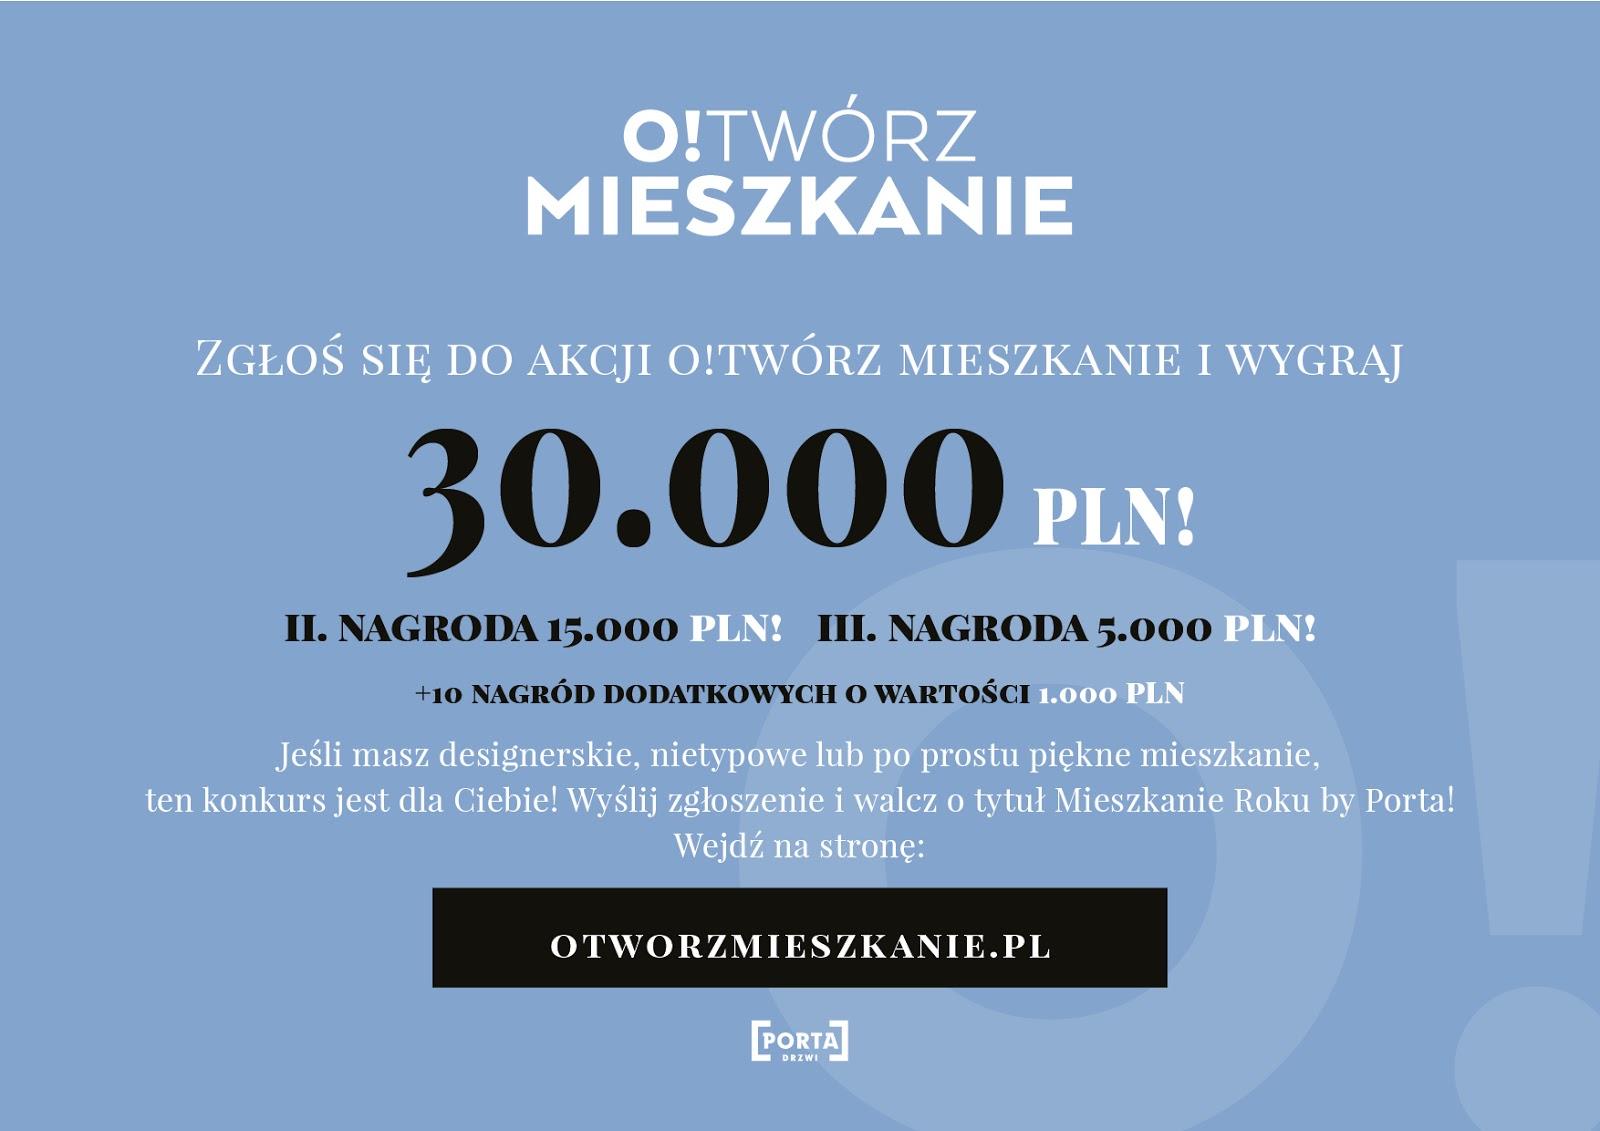 https://www.porta.com.pl/otworzsiena/otworz-mieszkanie?utm_source=zoykahome.pl&utm_medium=referral&utm_campaign=om_2019&utm_content=blog